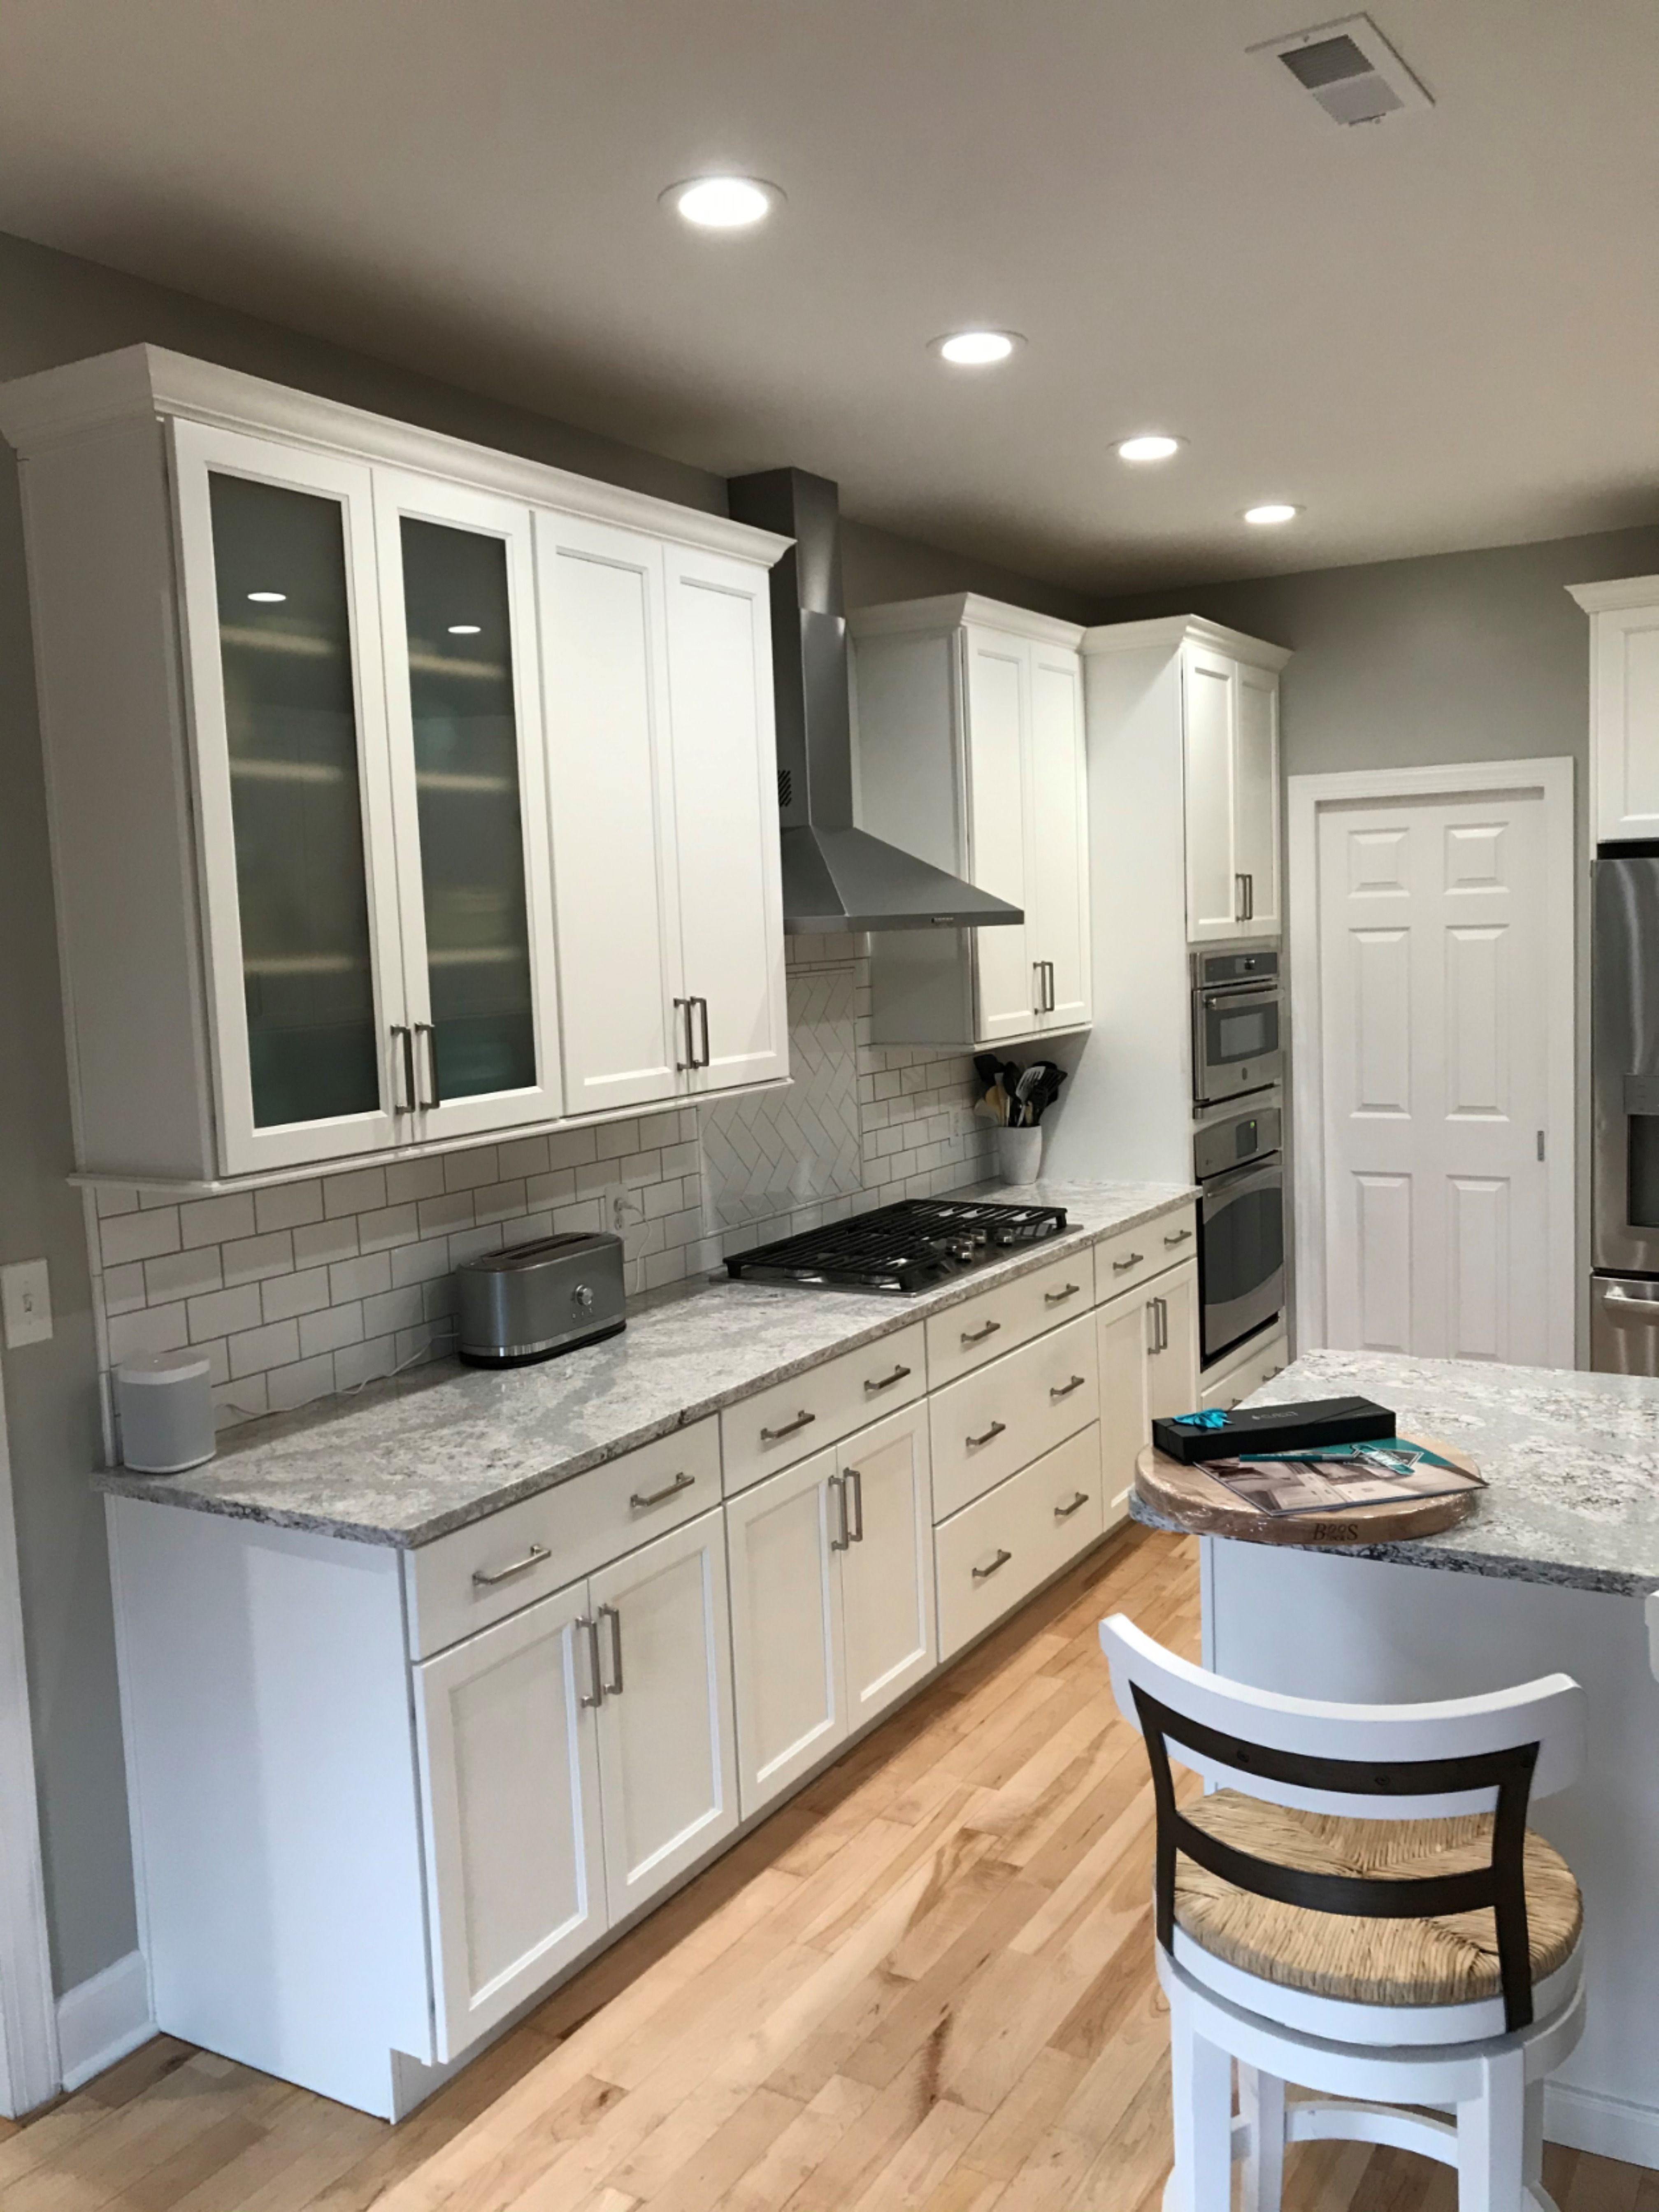 Kitchen Remodel In 2020 Kitchen Inspiration Design Cambria Quartz Kitchen Countertops Modern Kitchen Design